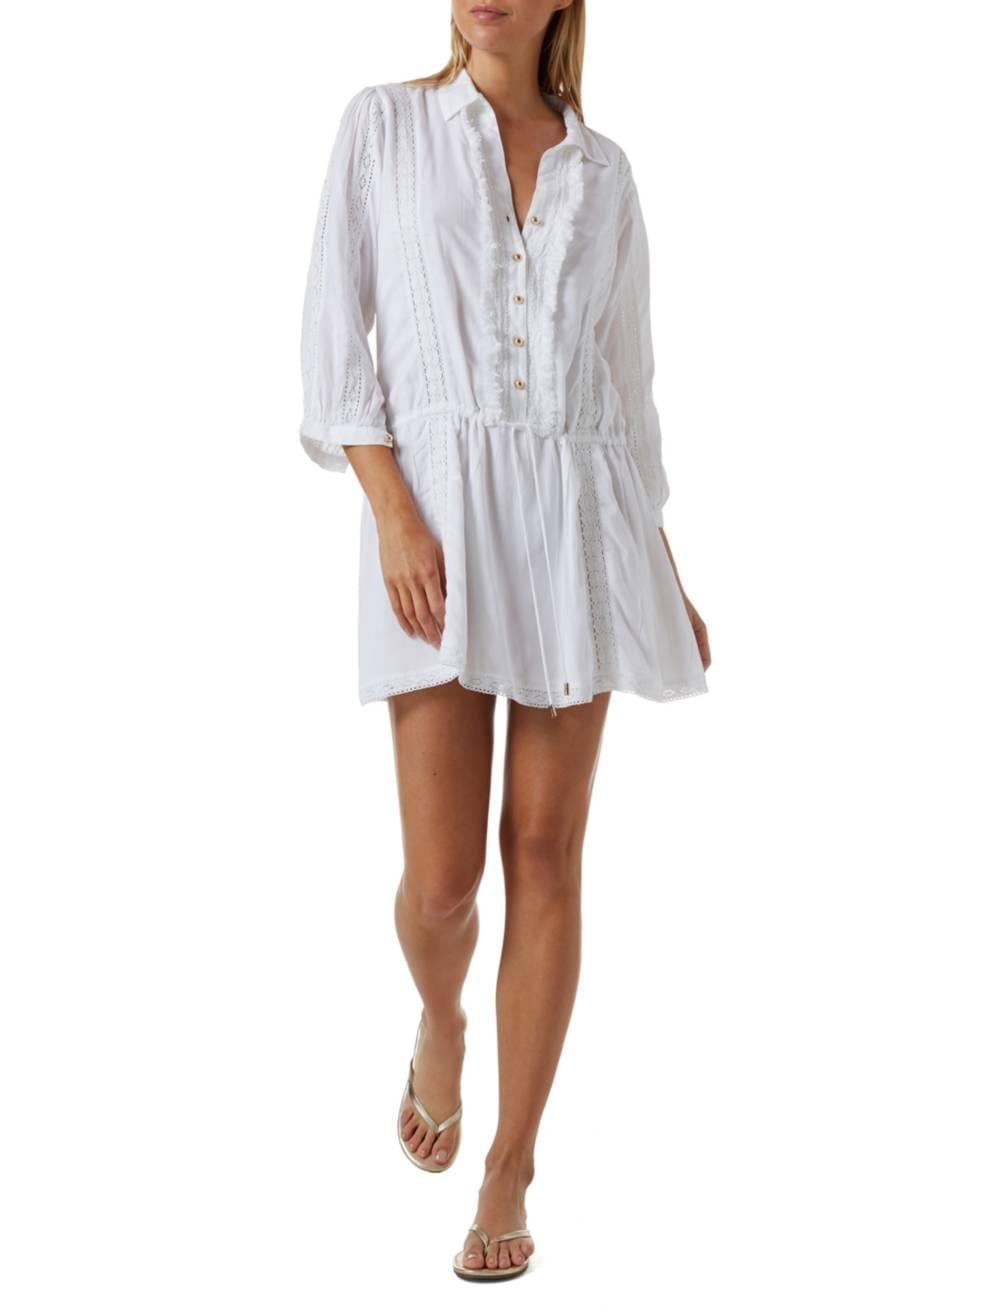 MELISSA ODABASH Scarlett Lace Trim Shirt Dress